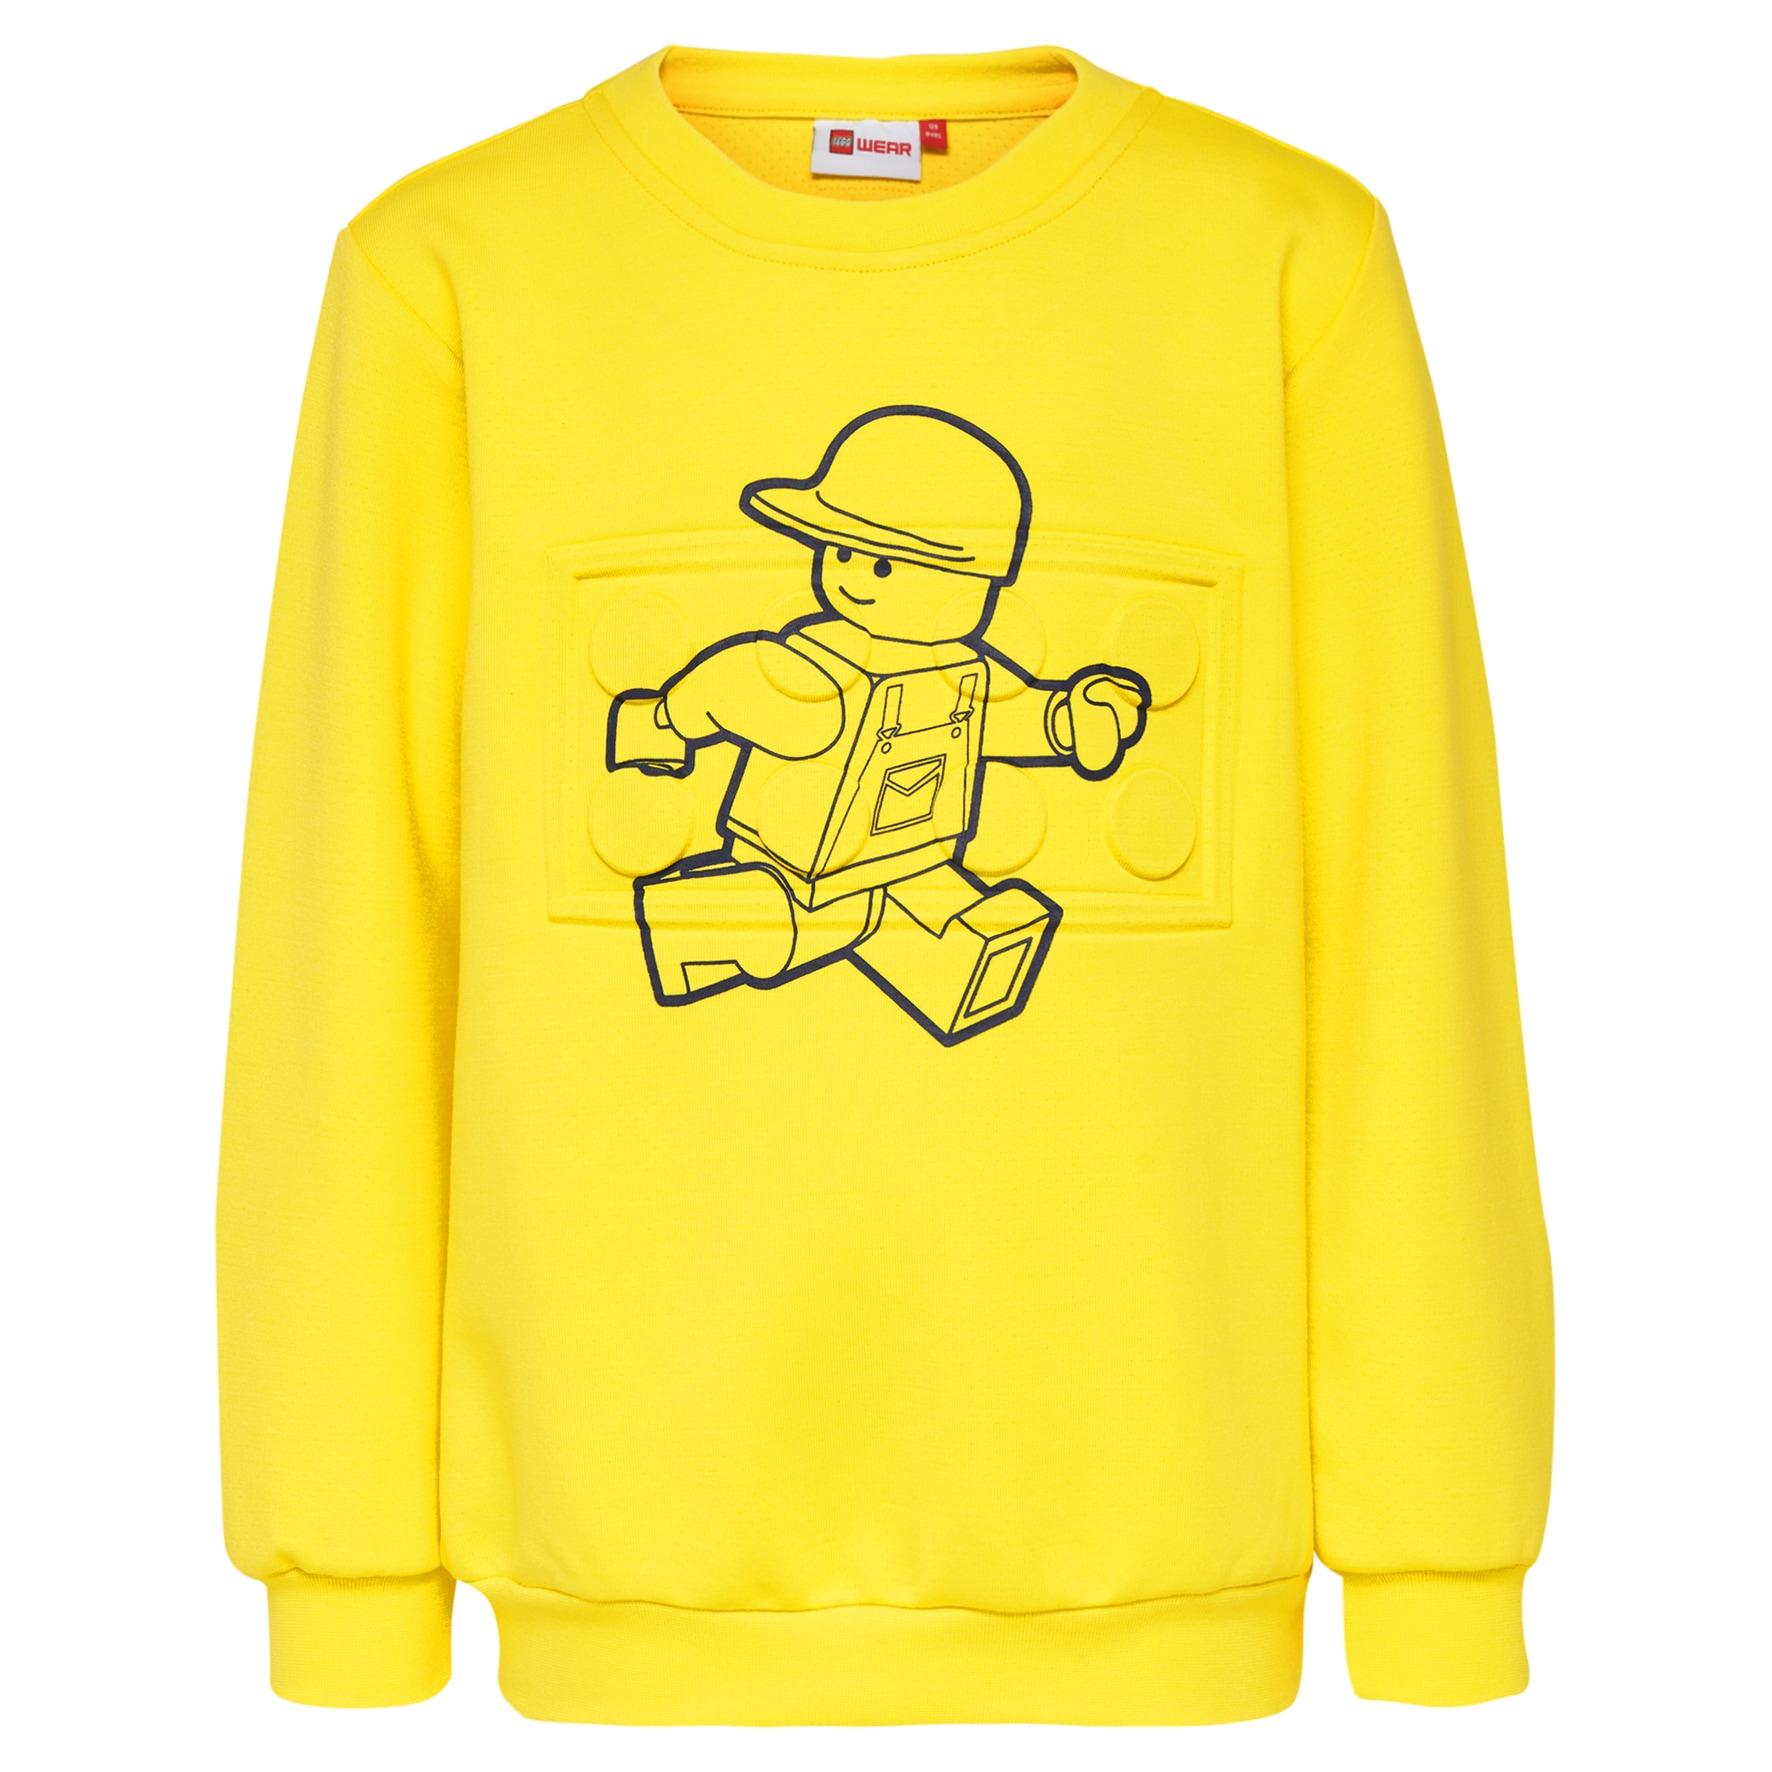 LEGO Wear Sweatshirt SIAM 328 Preisvergleich